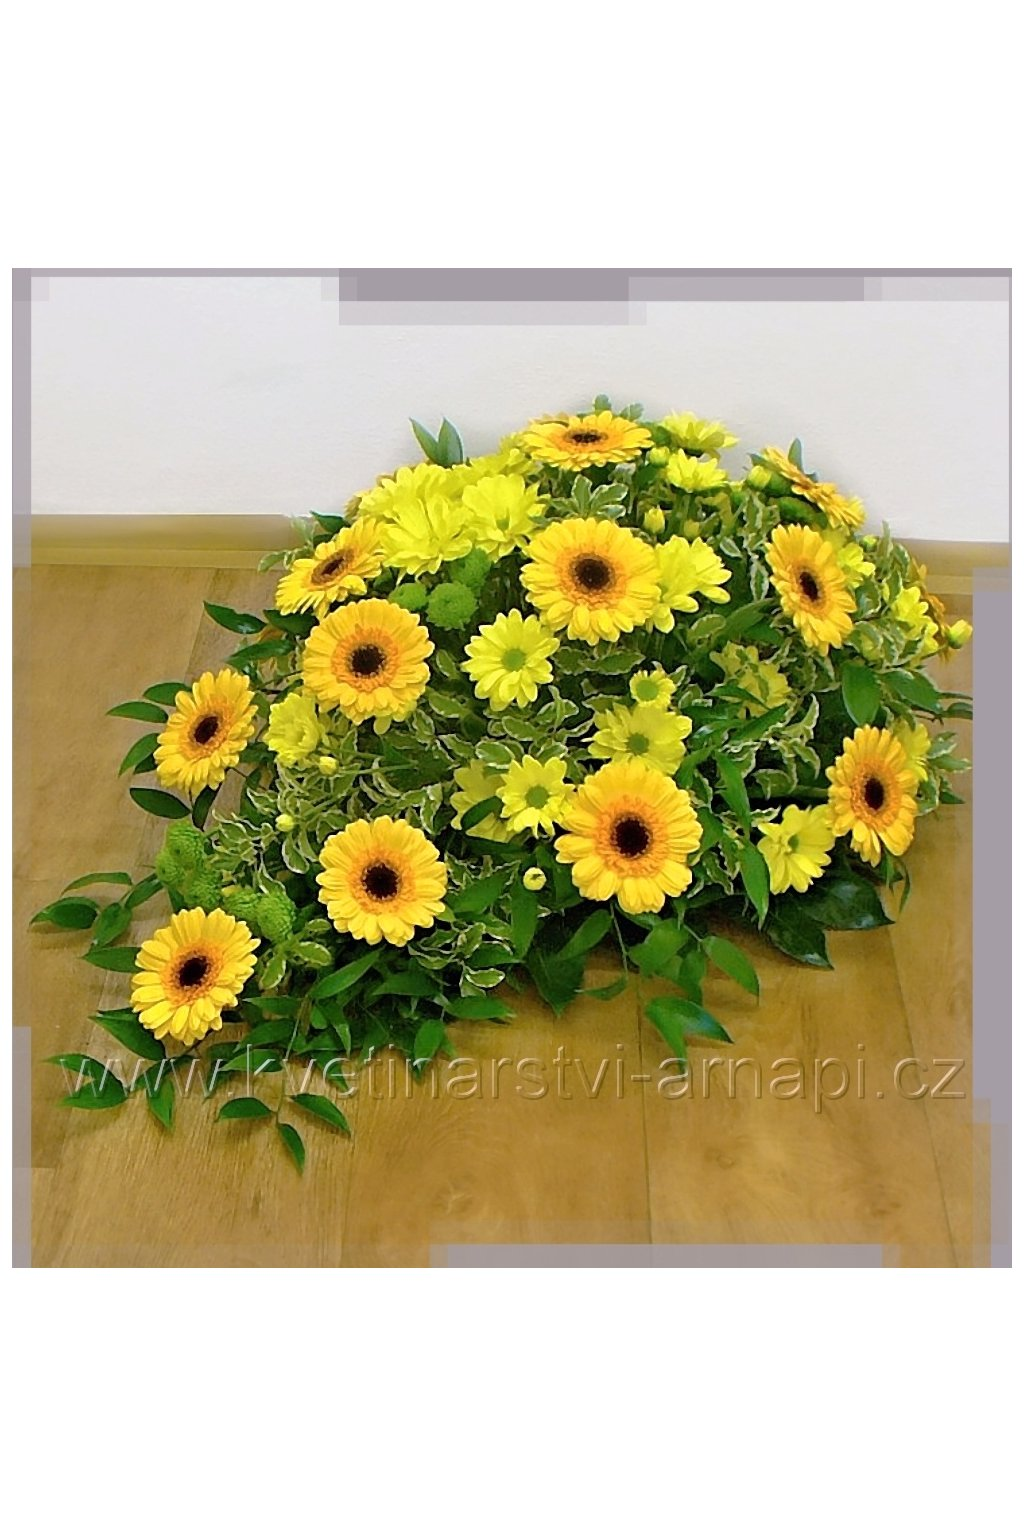 smutecni kytice gerbery zlute kvetinarstvi arnapi